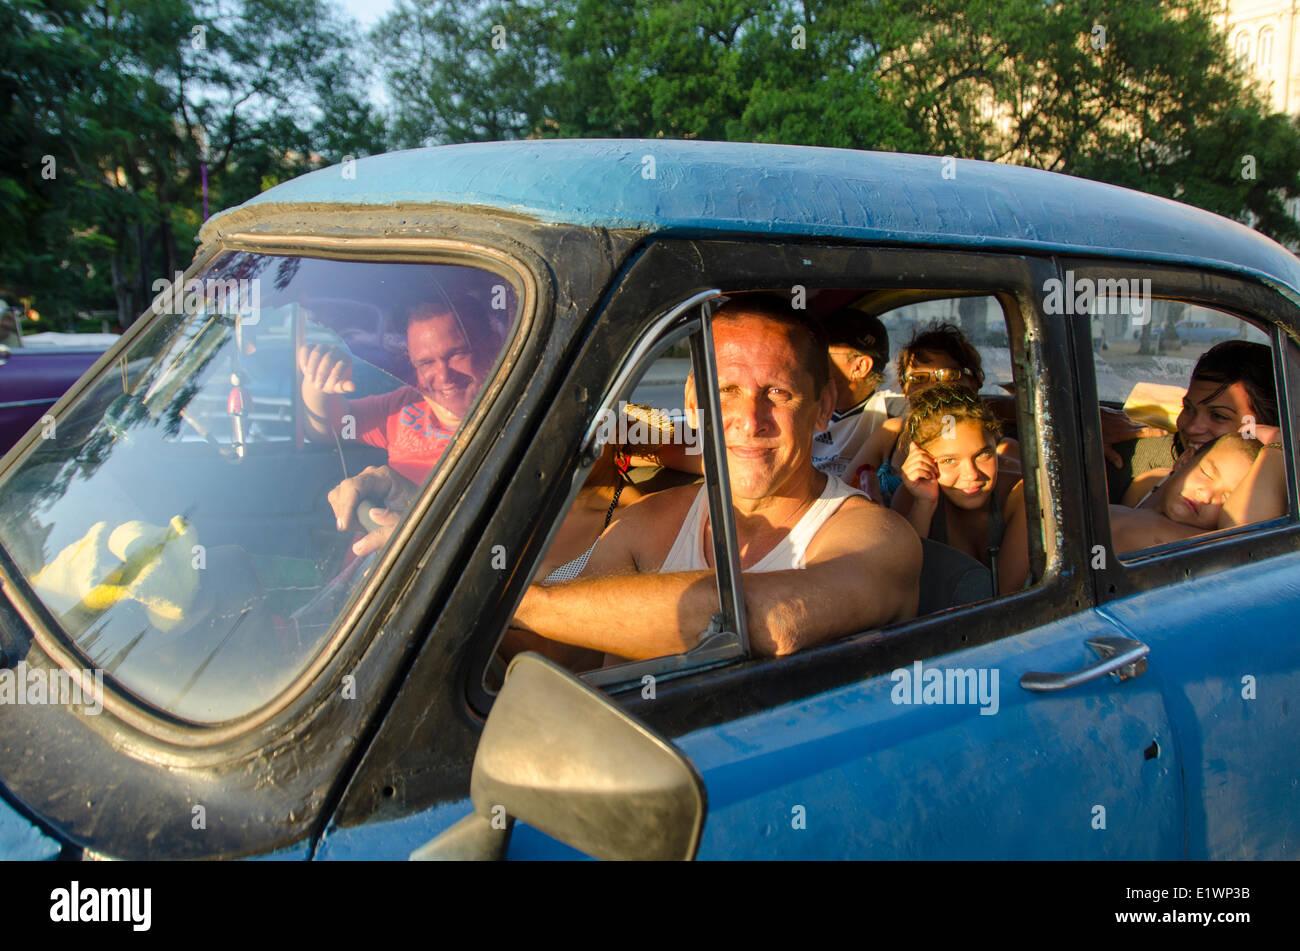 Cuban people in old car, Havana, Cuba - Stock Image